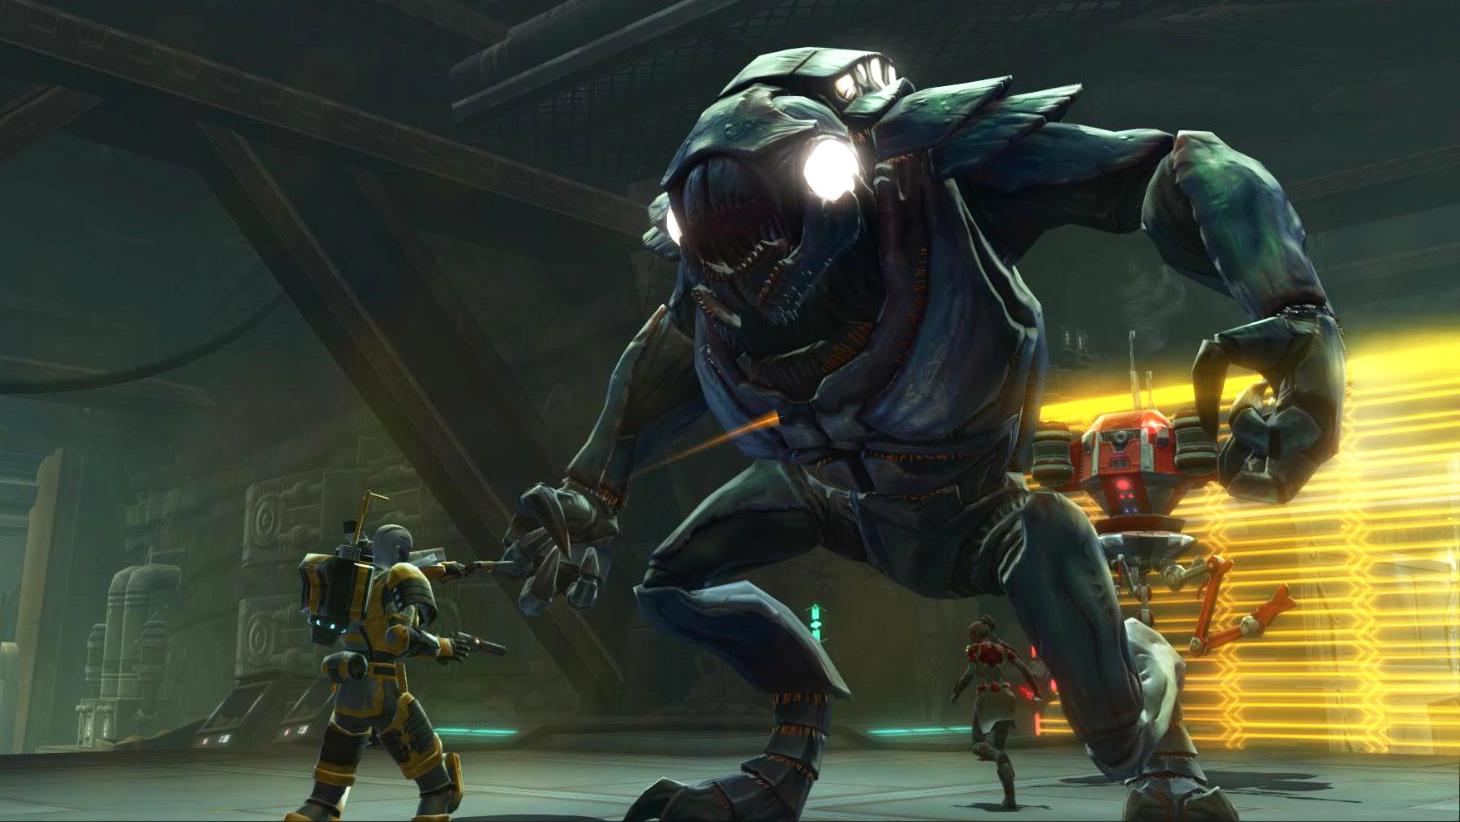 SWTOR Defend The Throne Update Developer Interview